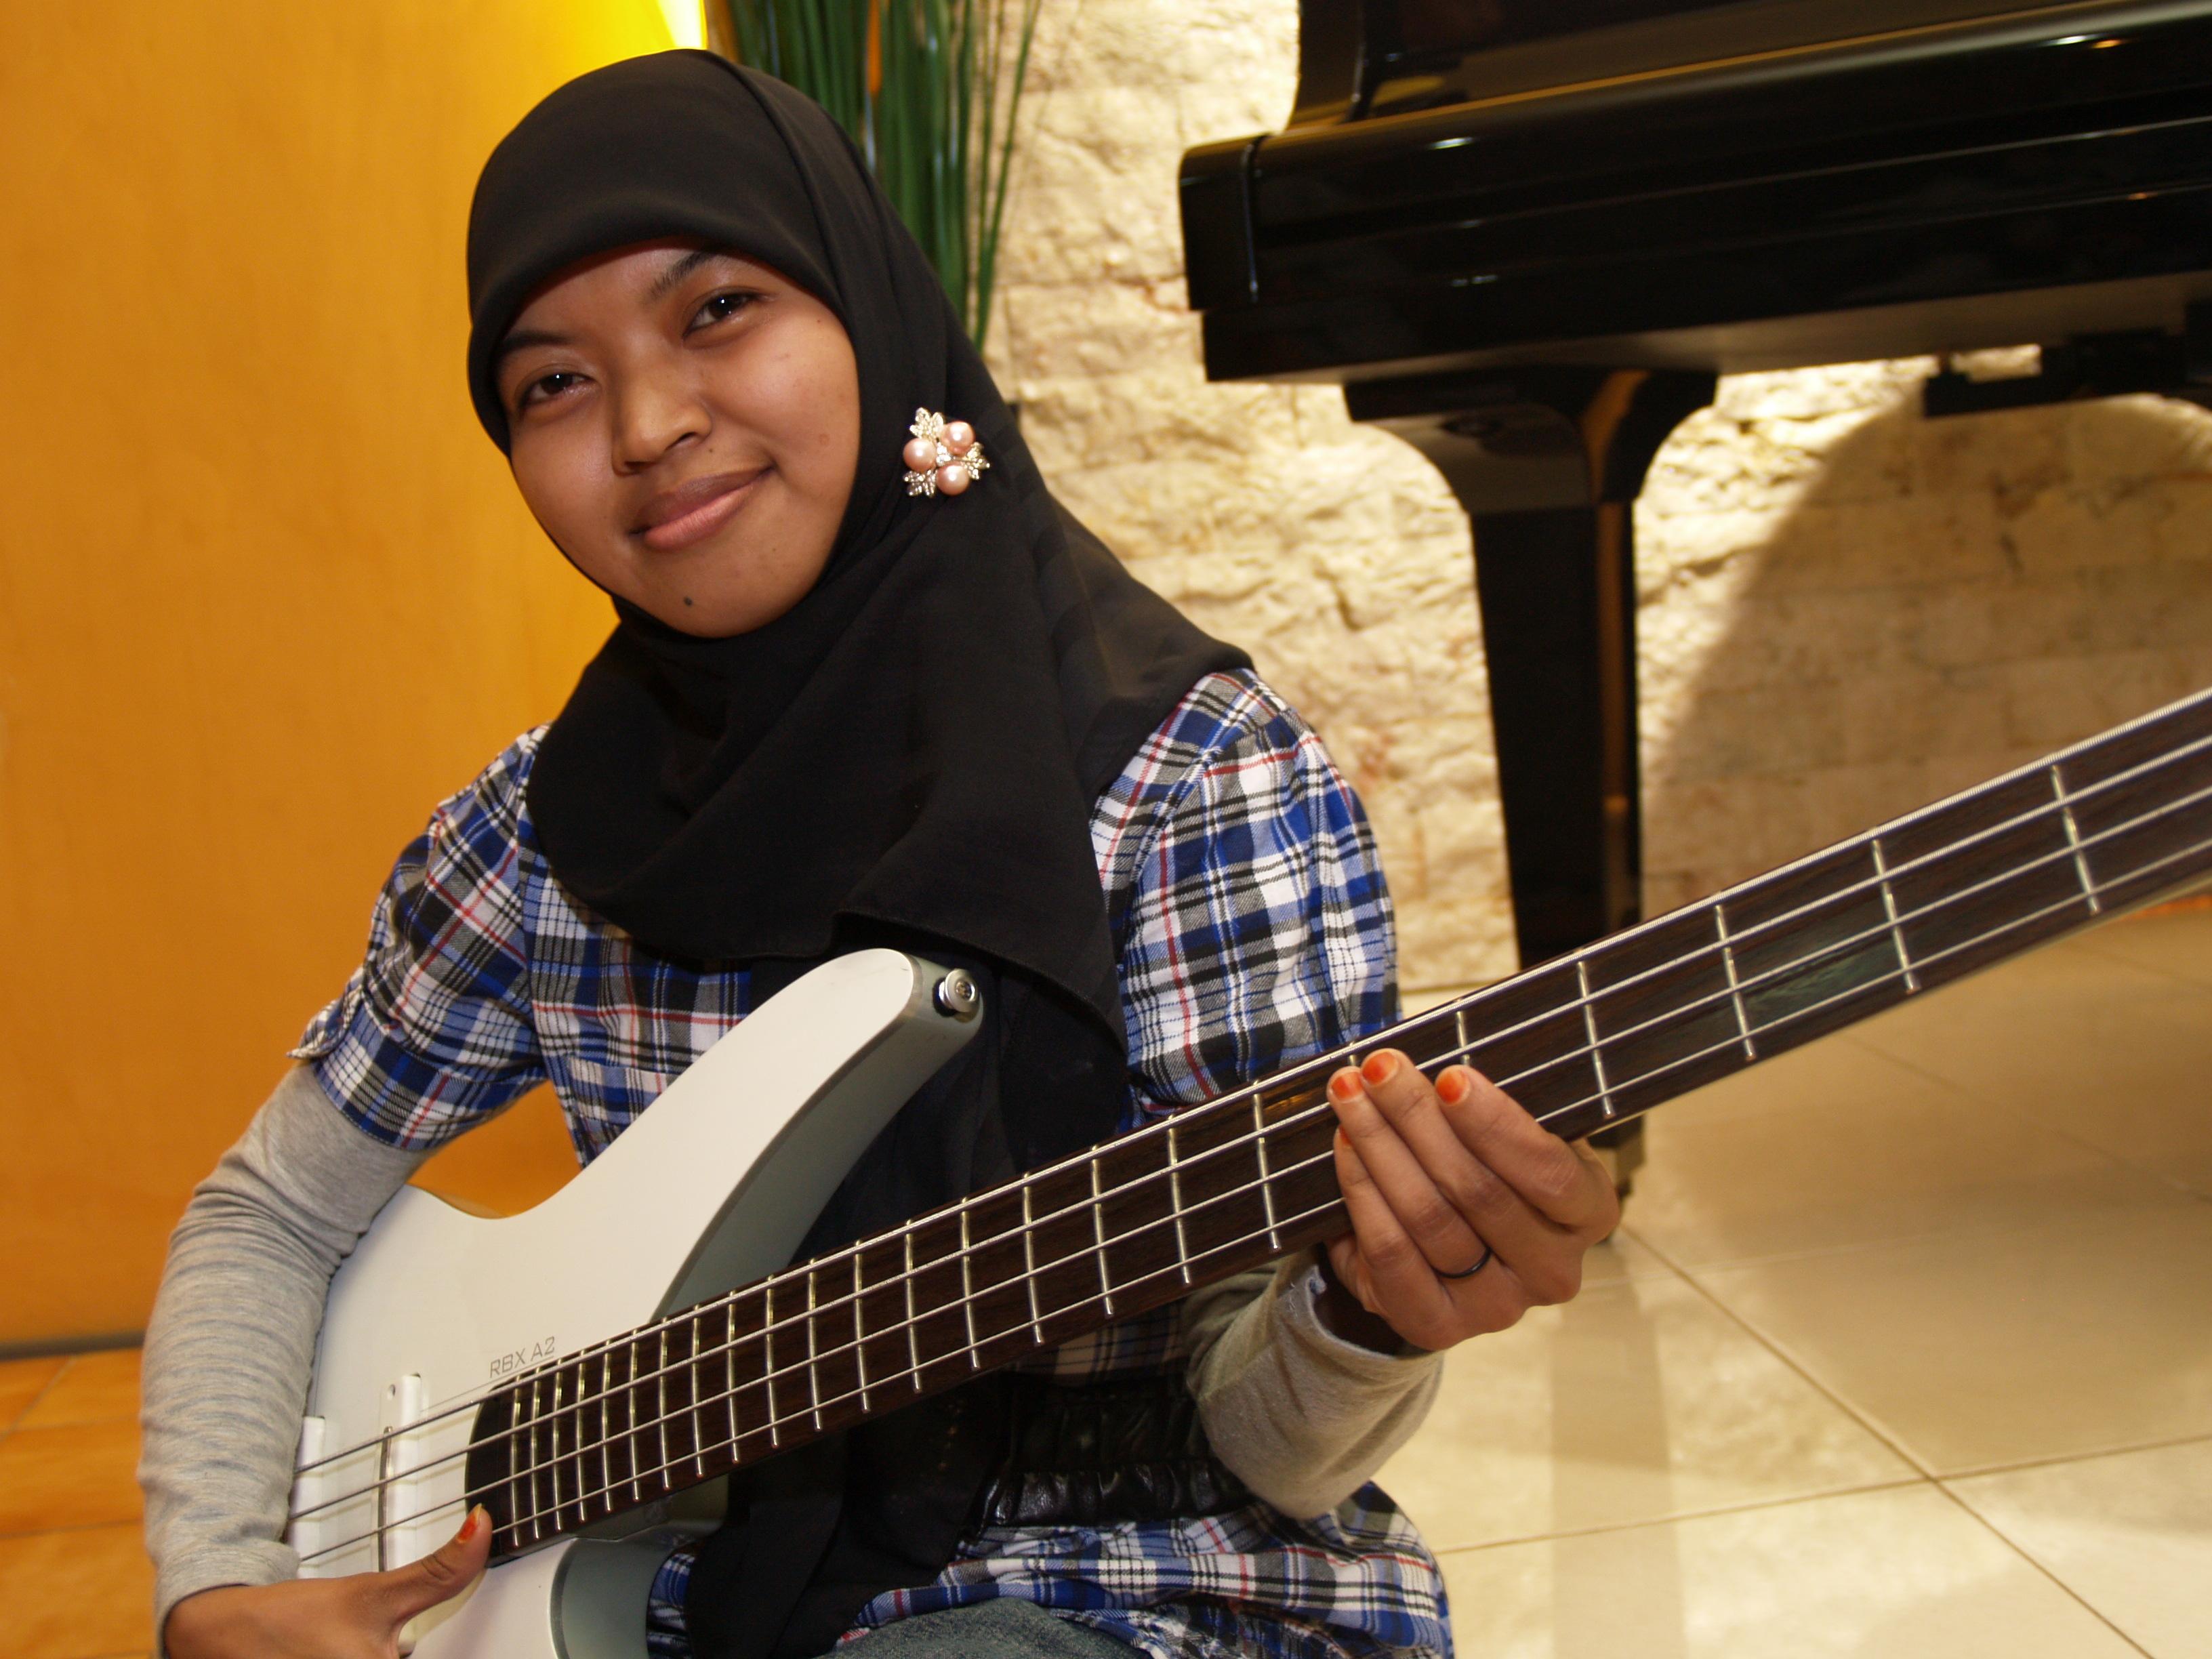 Tentang Cinta.  sc 1 st  Salmah Sumayya - WordPress.com & Cinta Bisa Mengubah Benci Jadi Bahagia | Salmah Sumayya